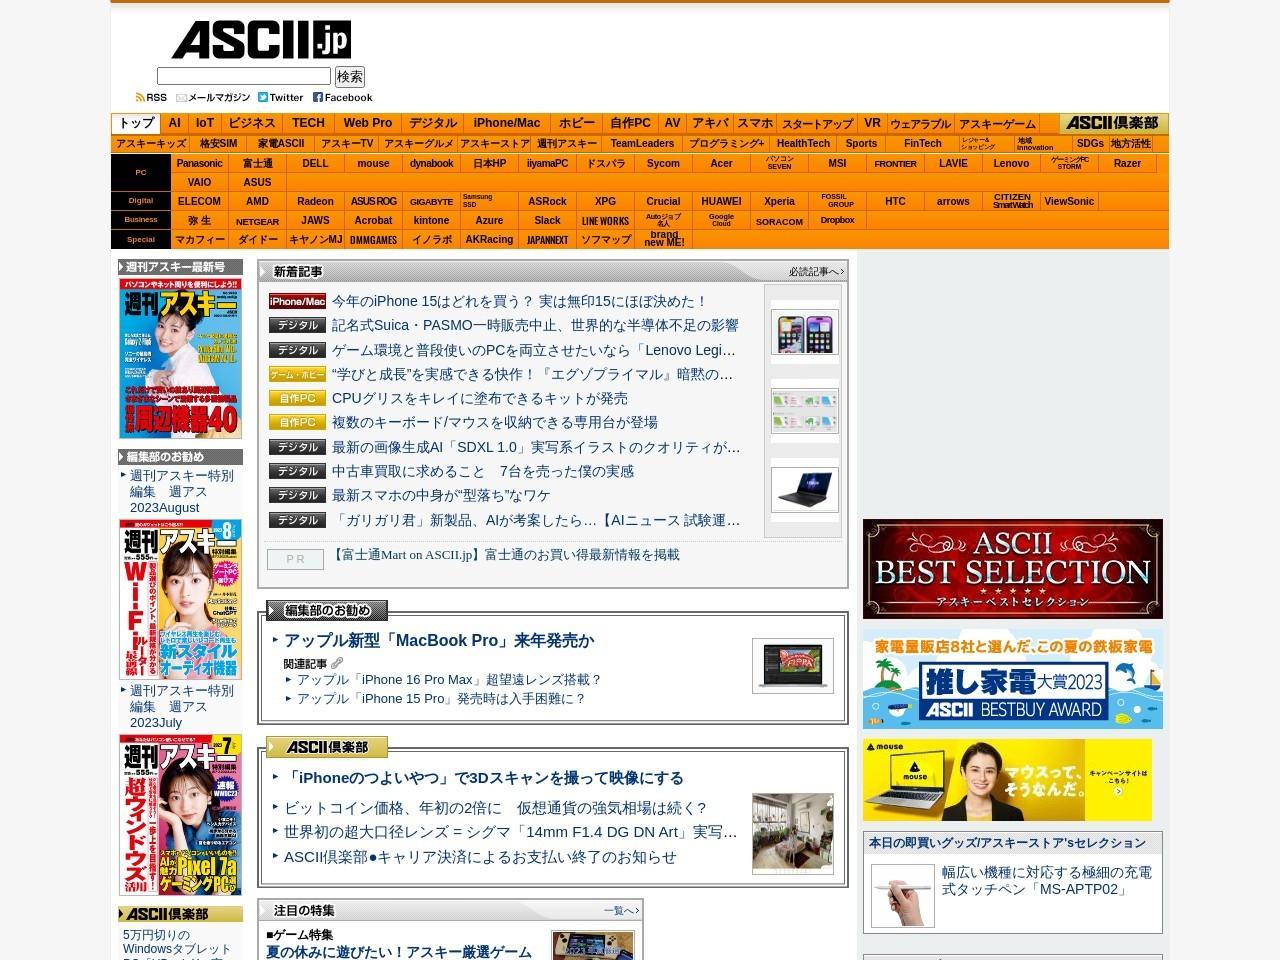 http://ascii.jp/elem/000/000/602/602620/